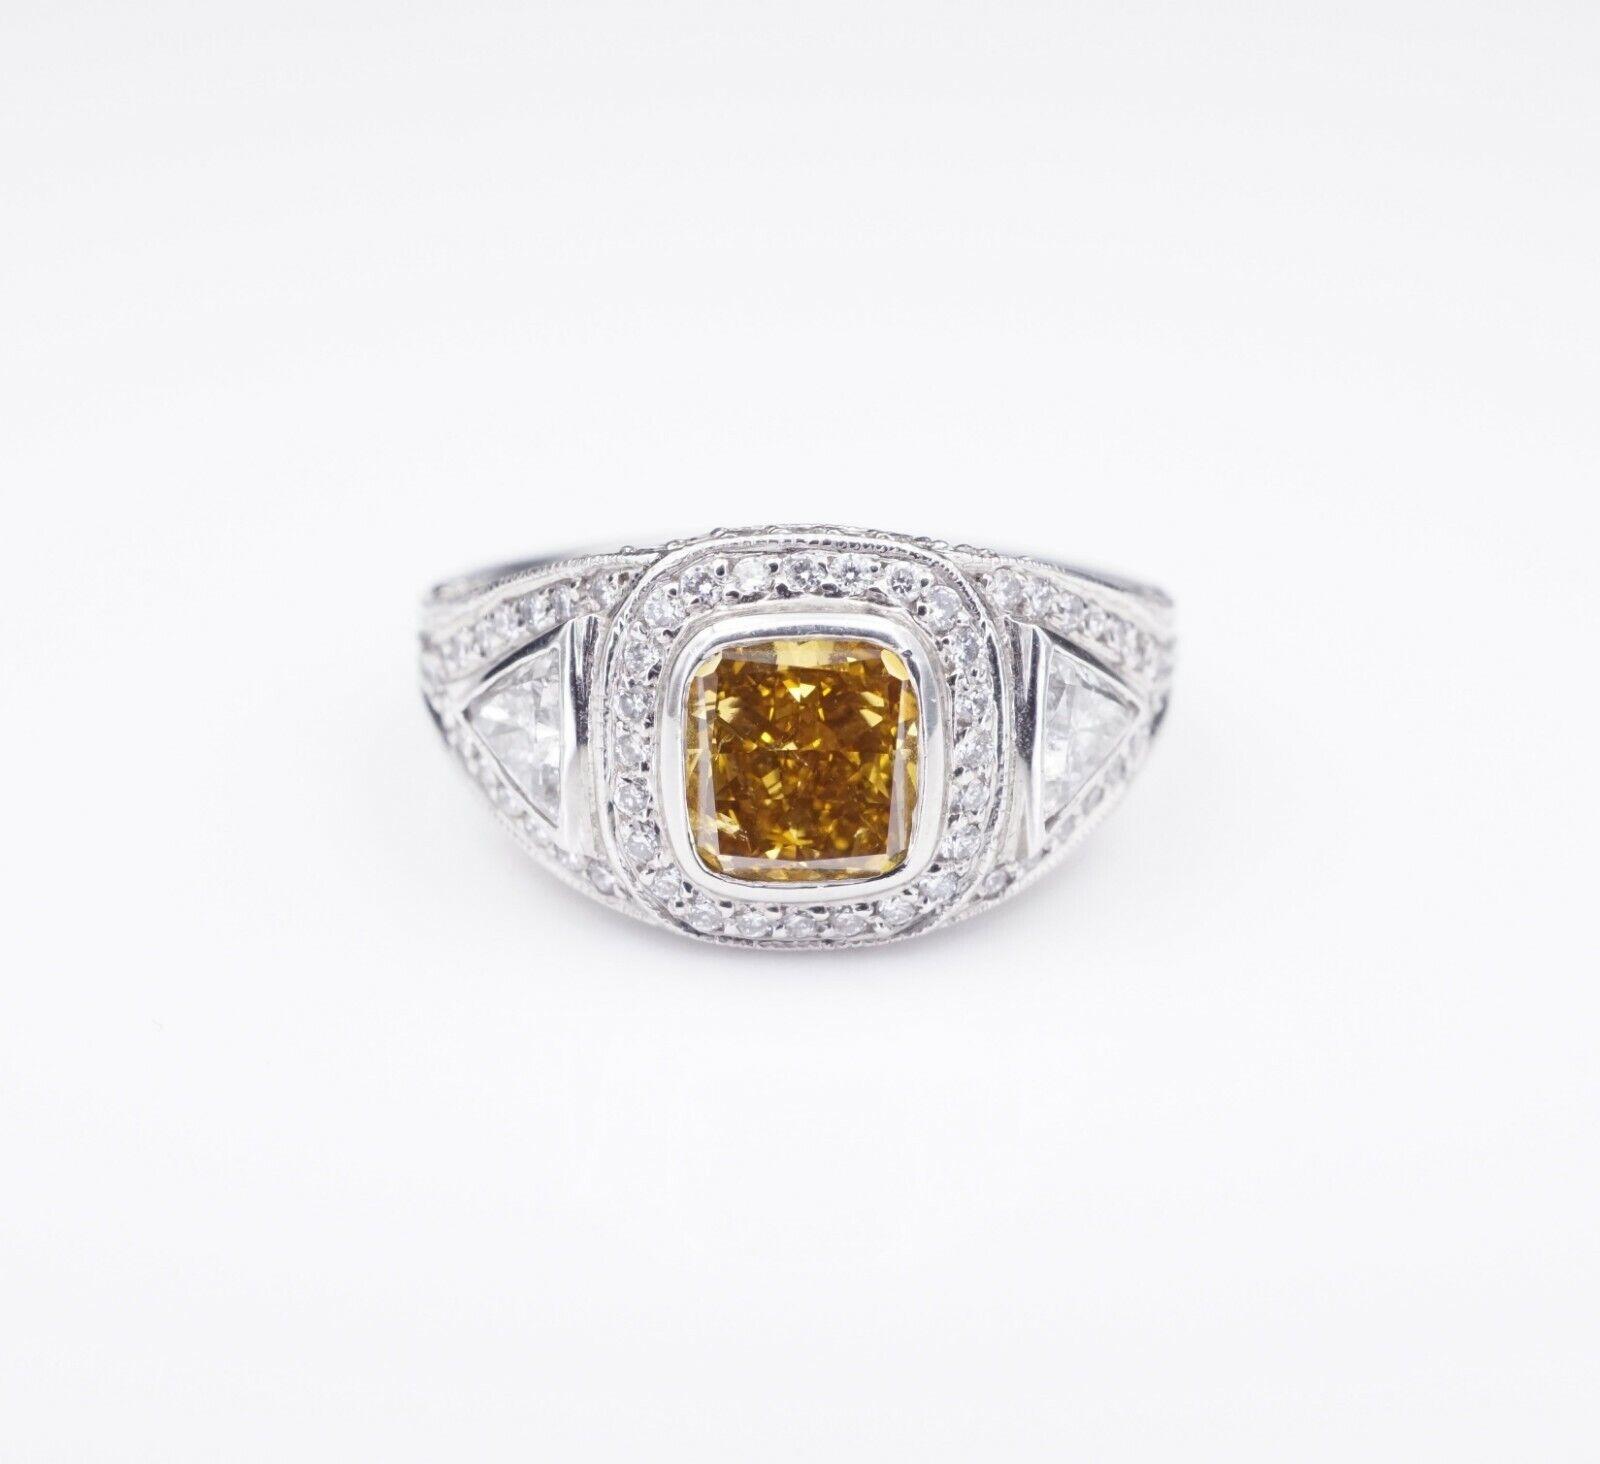 Platinum 3ct Orange-Yellow Diamond Halo Engagement Ring Size 6.75 GIA CO450 1